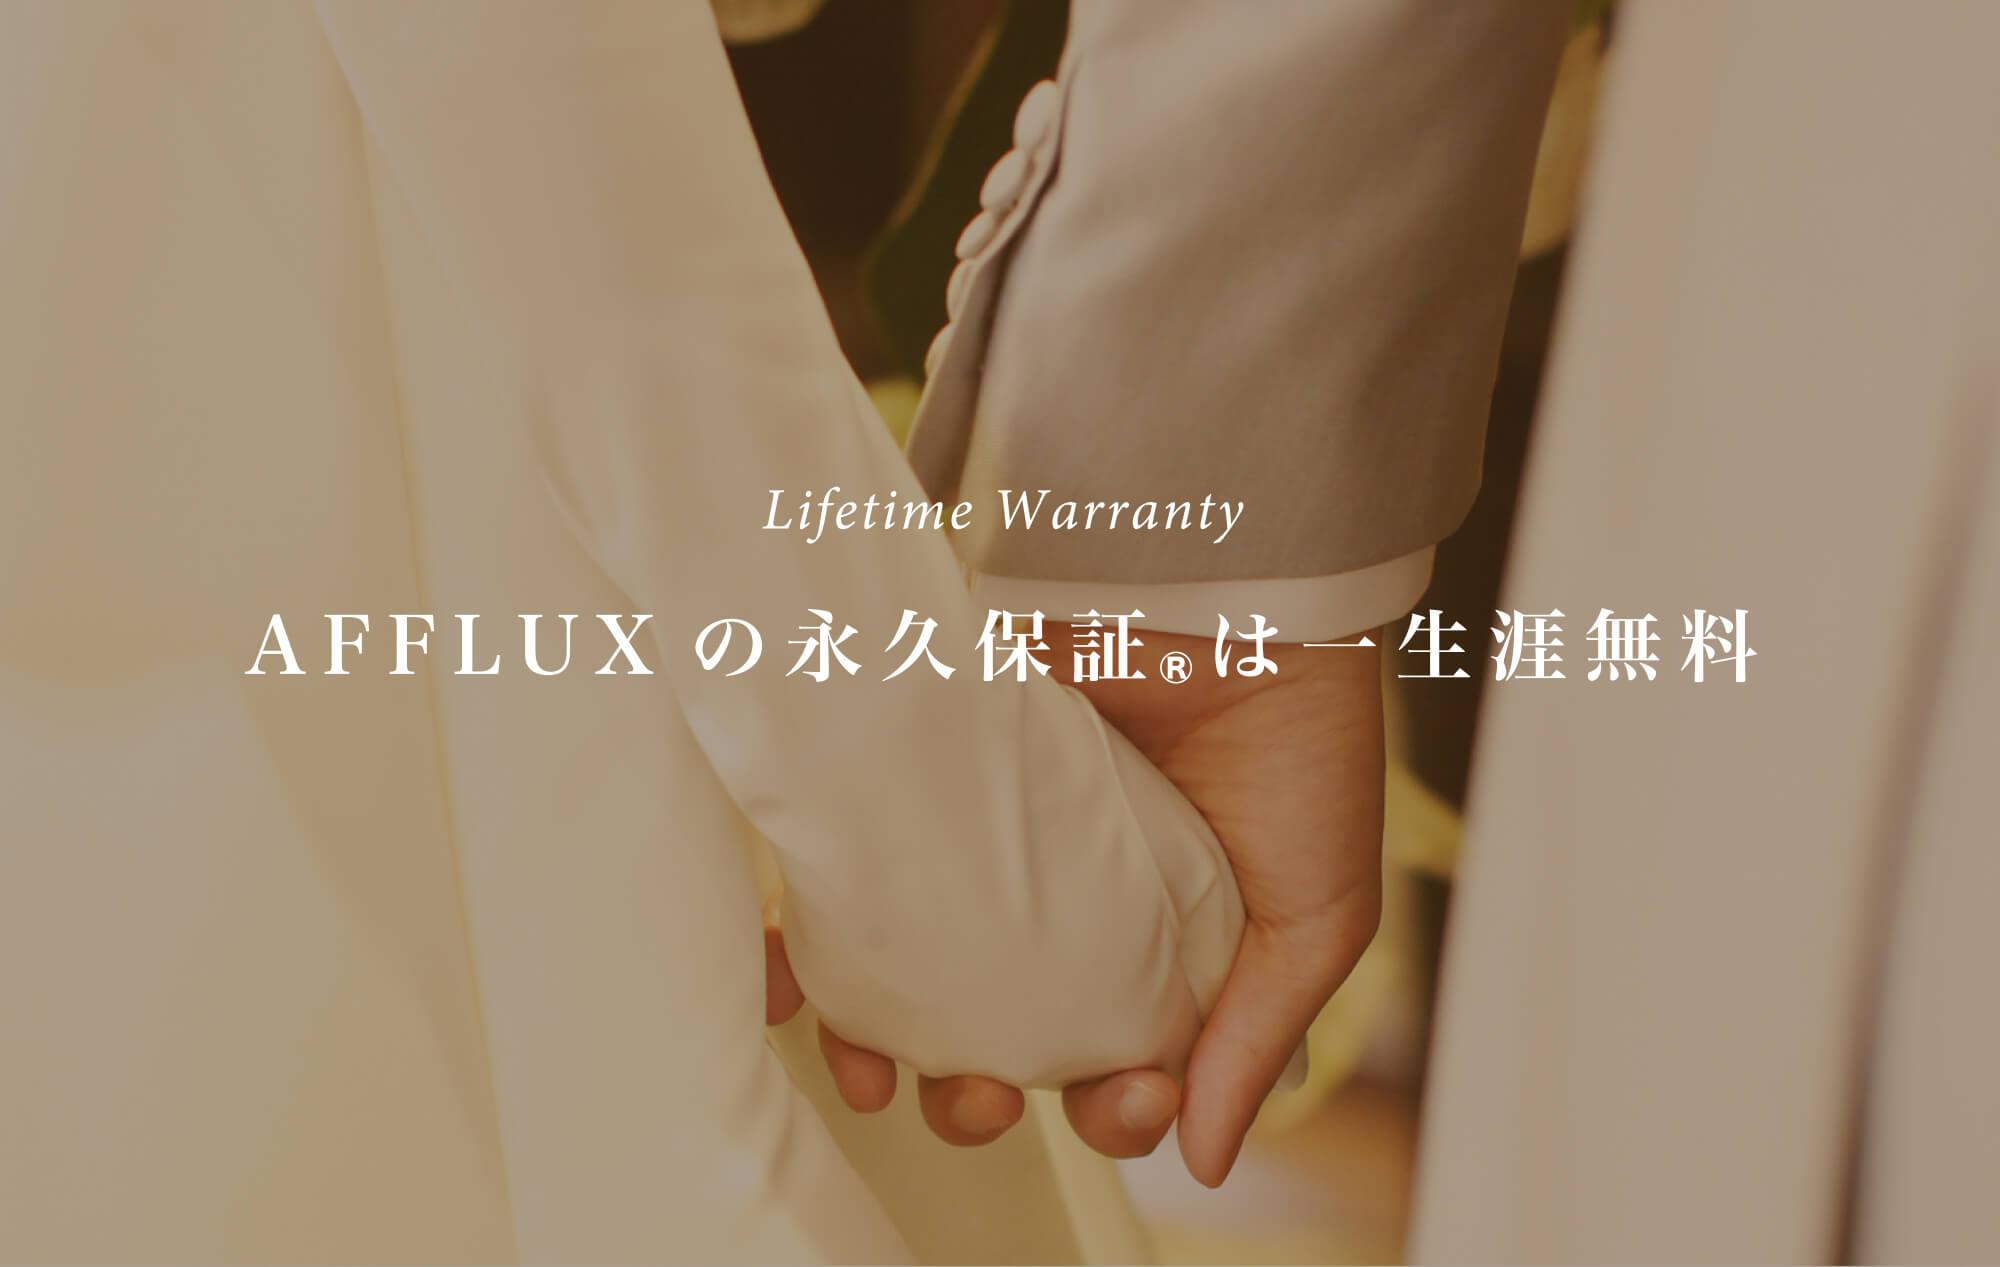 Lifetime Warranty AFFLUXの永久保証®は一生涯無料